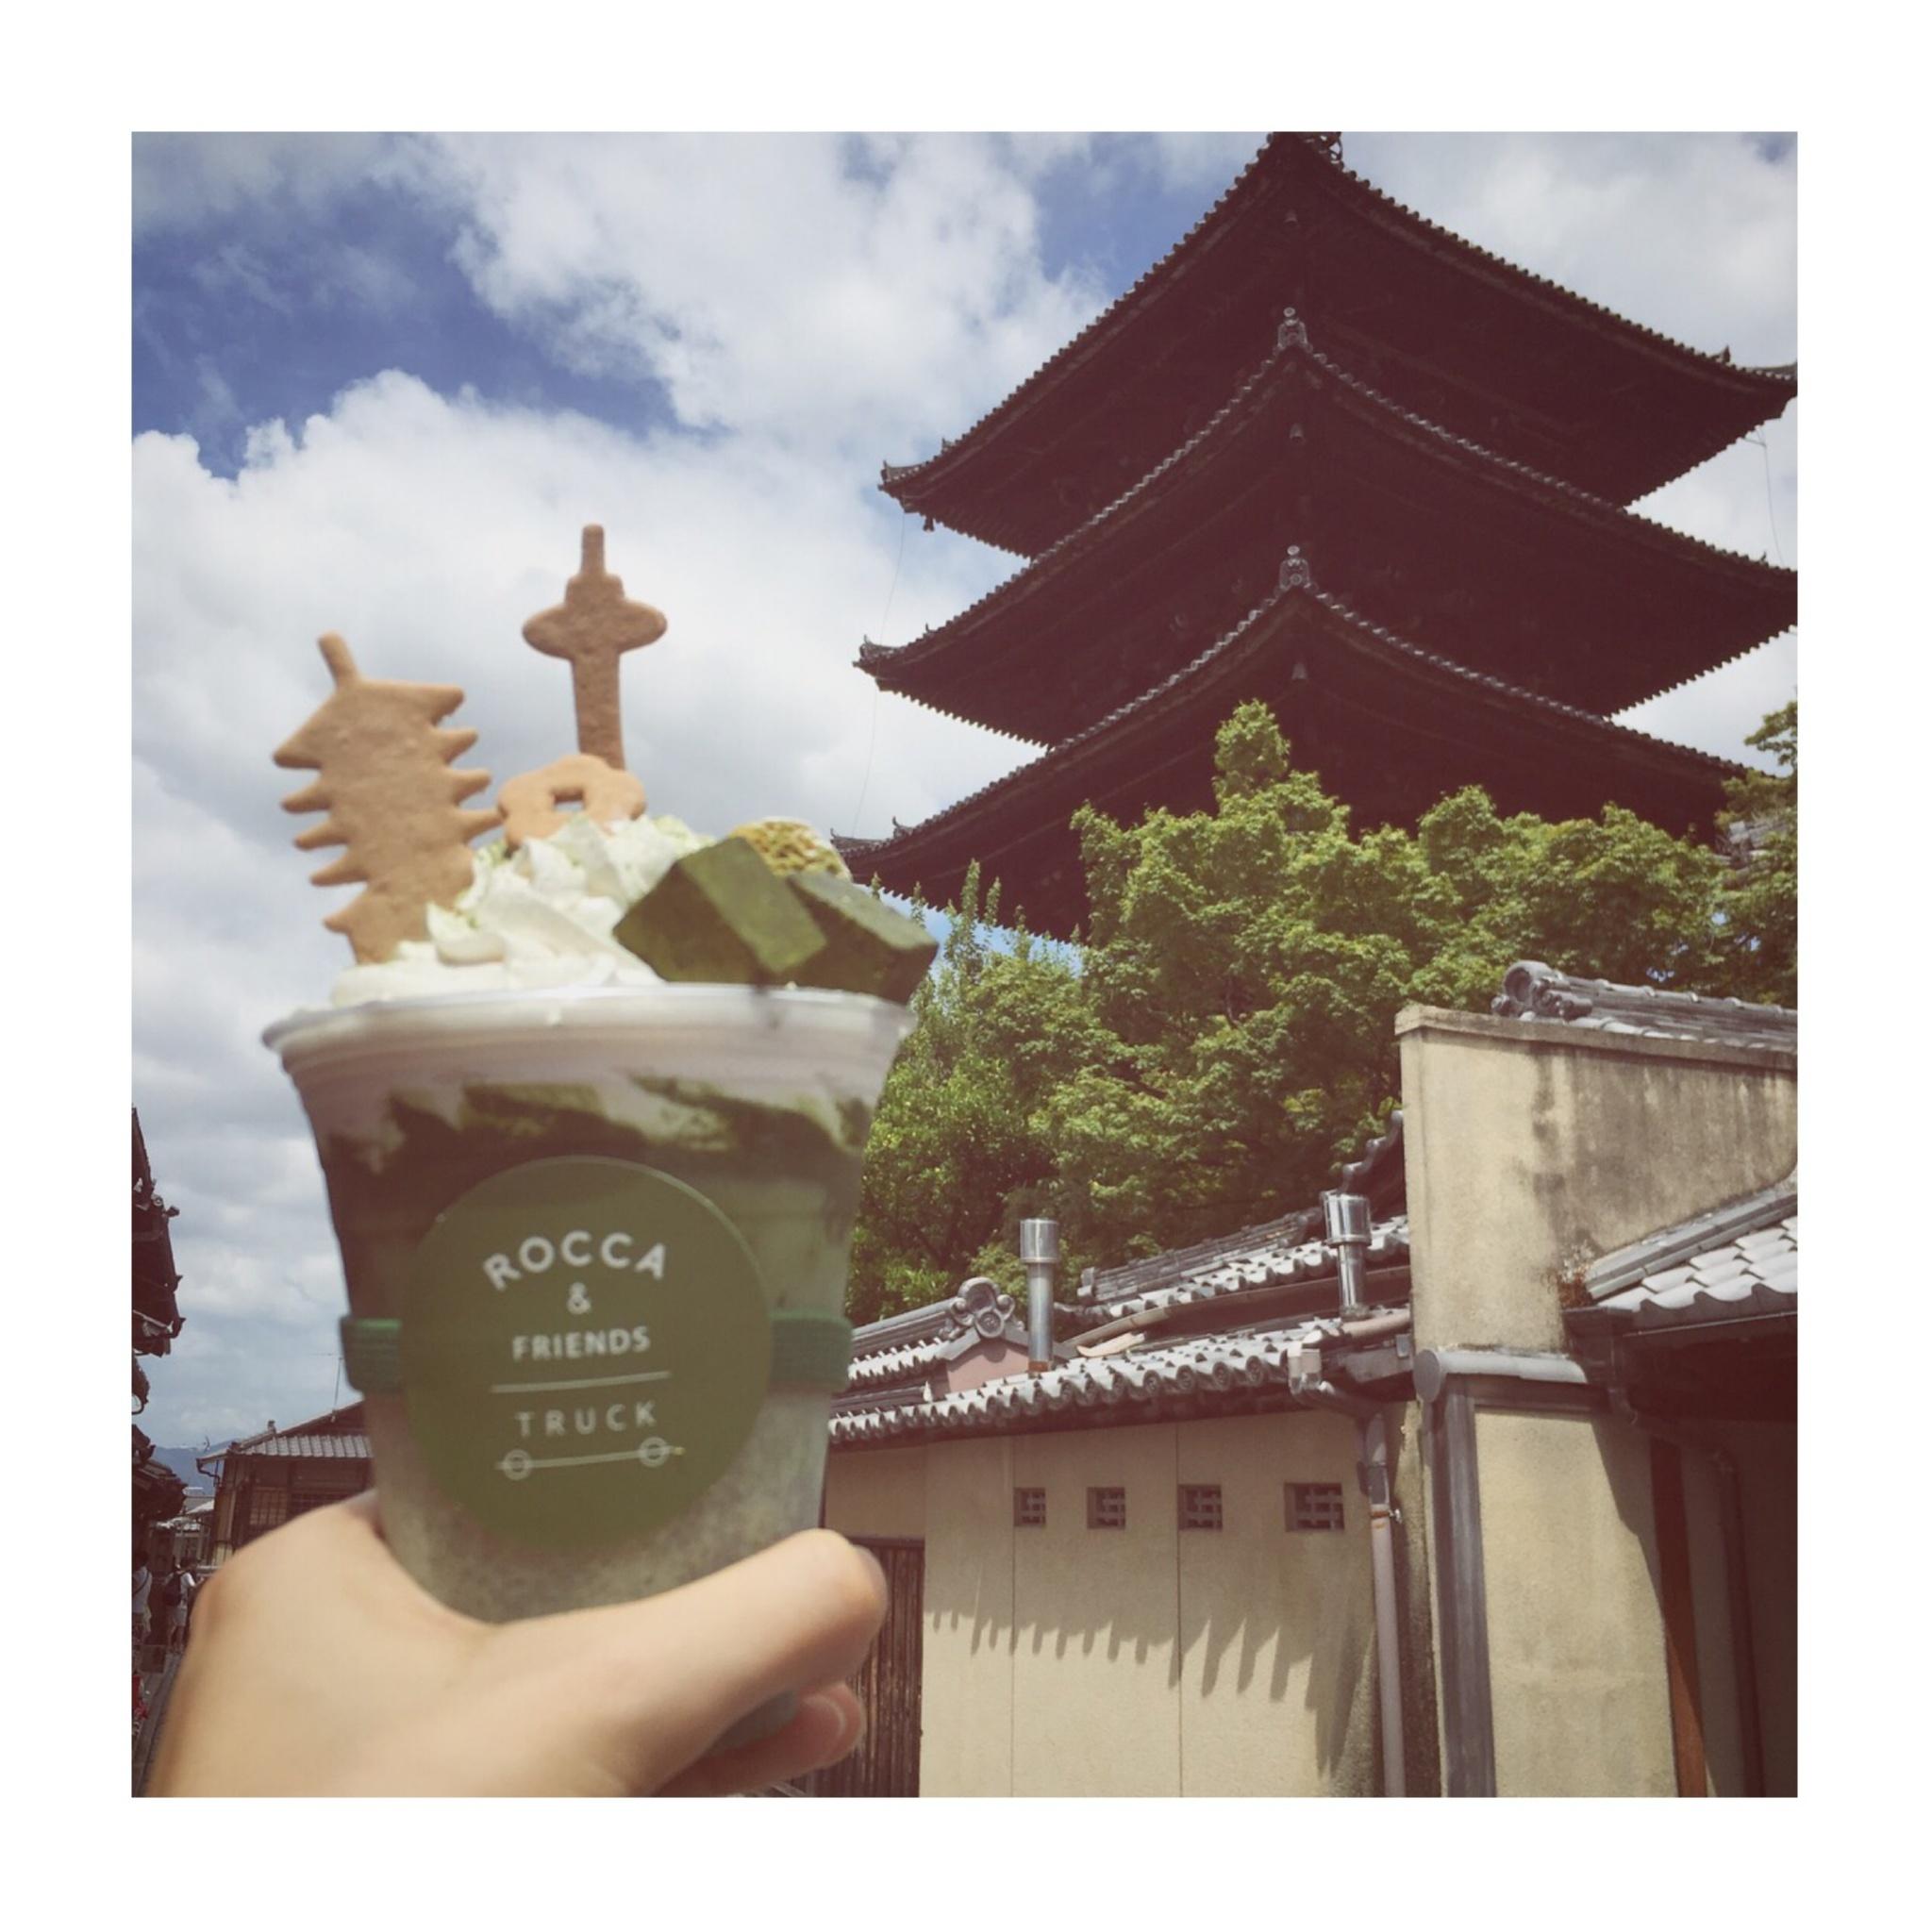 #5【#cafestagram】❤️:《京都》に行ったら絶対飲みたい!ROCCA&FRIENDS TRUCKの抹茶ラテがかわいすぎる◡̈_5